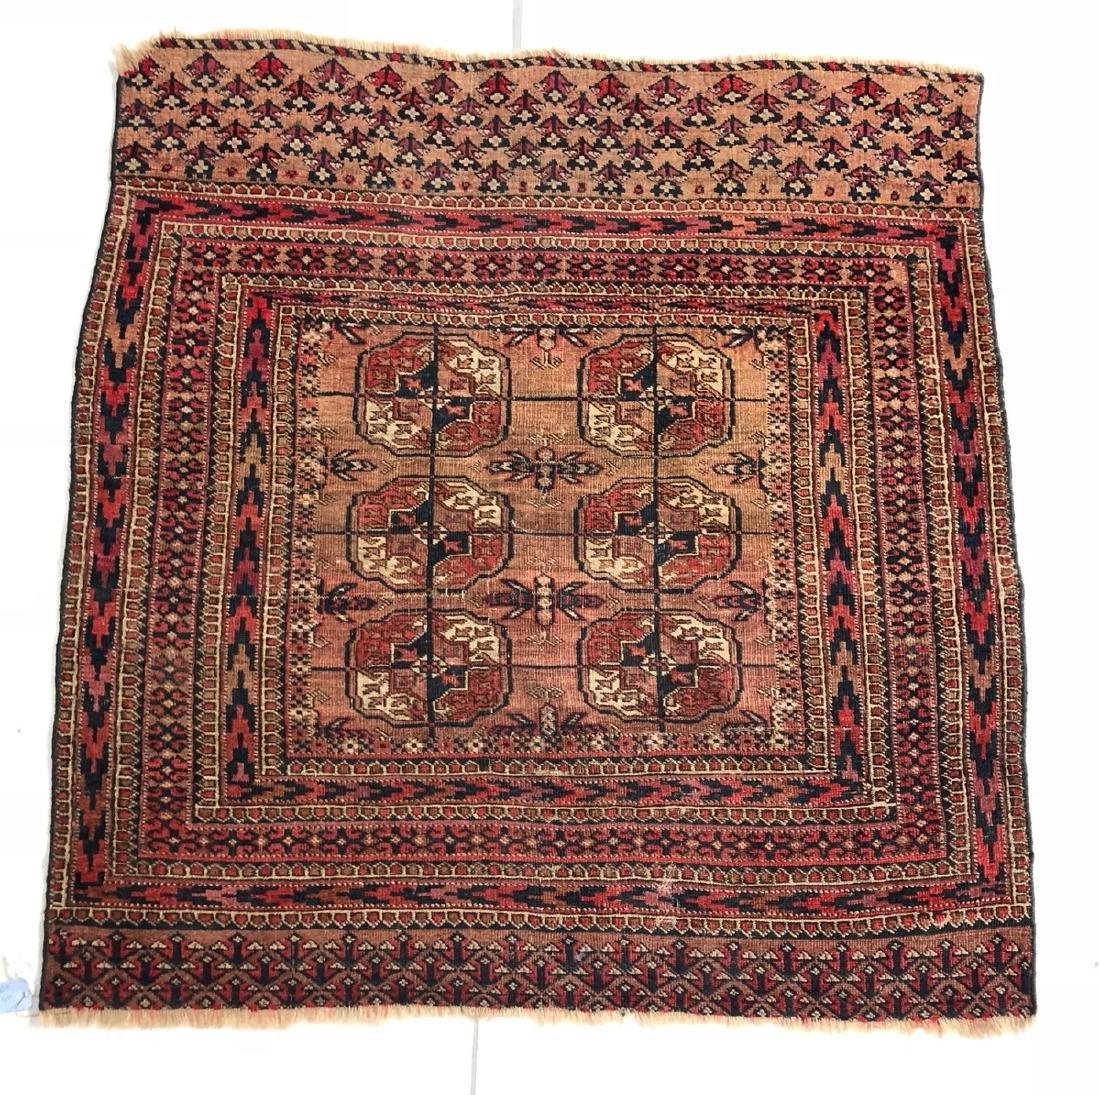 4'6 x 3'4 Handmade Oriental Mat Carpet Rug.  Geom